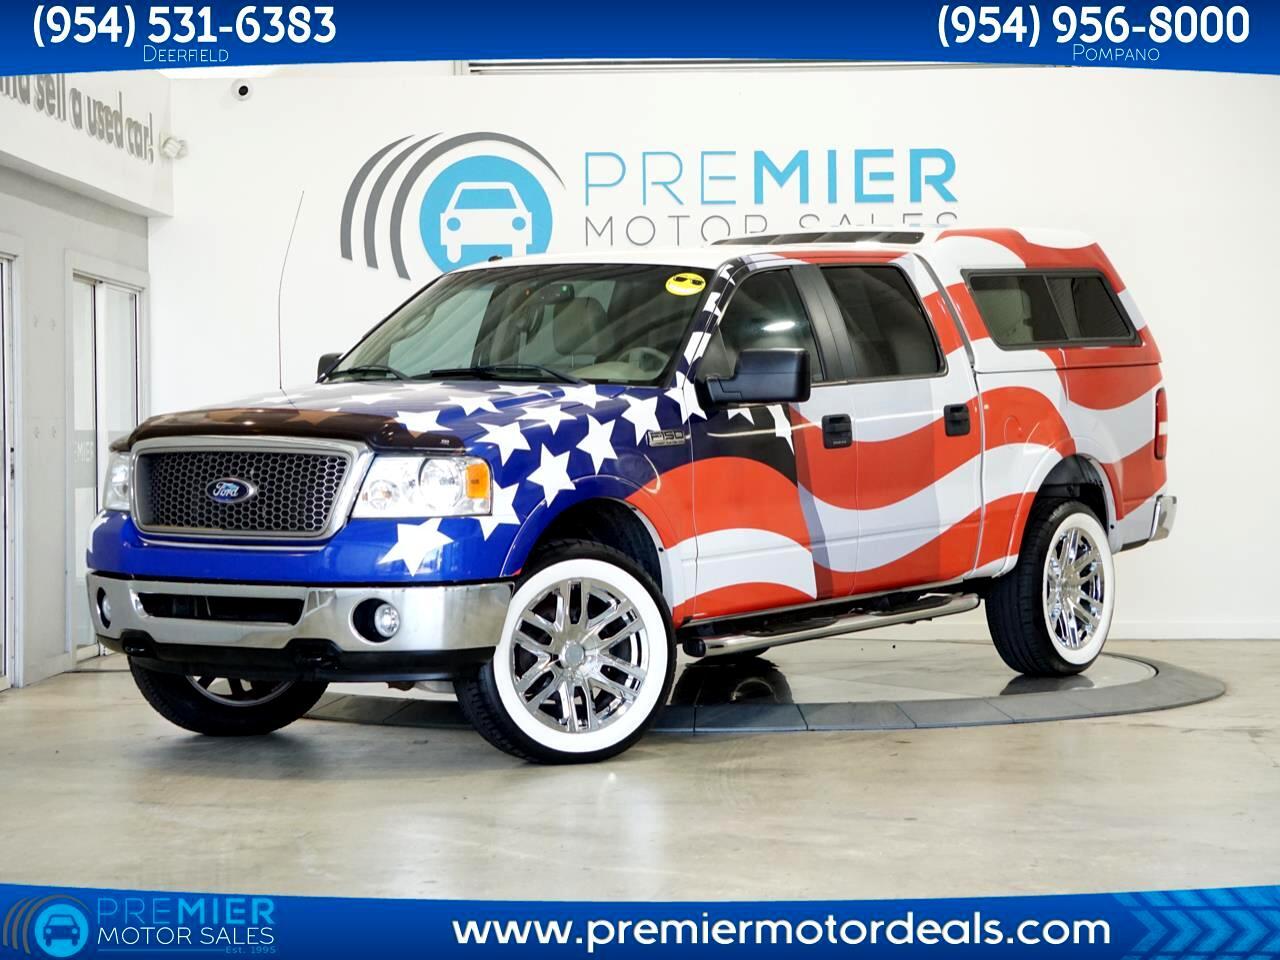 Ford F-150 XLT SuperCrew Short Box 4WD 2007